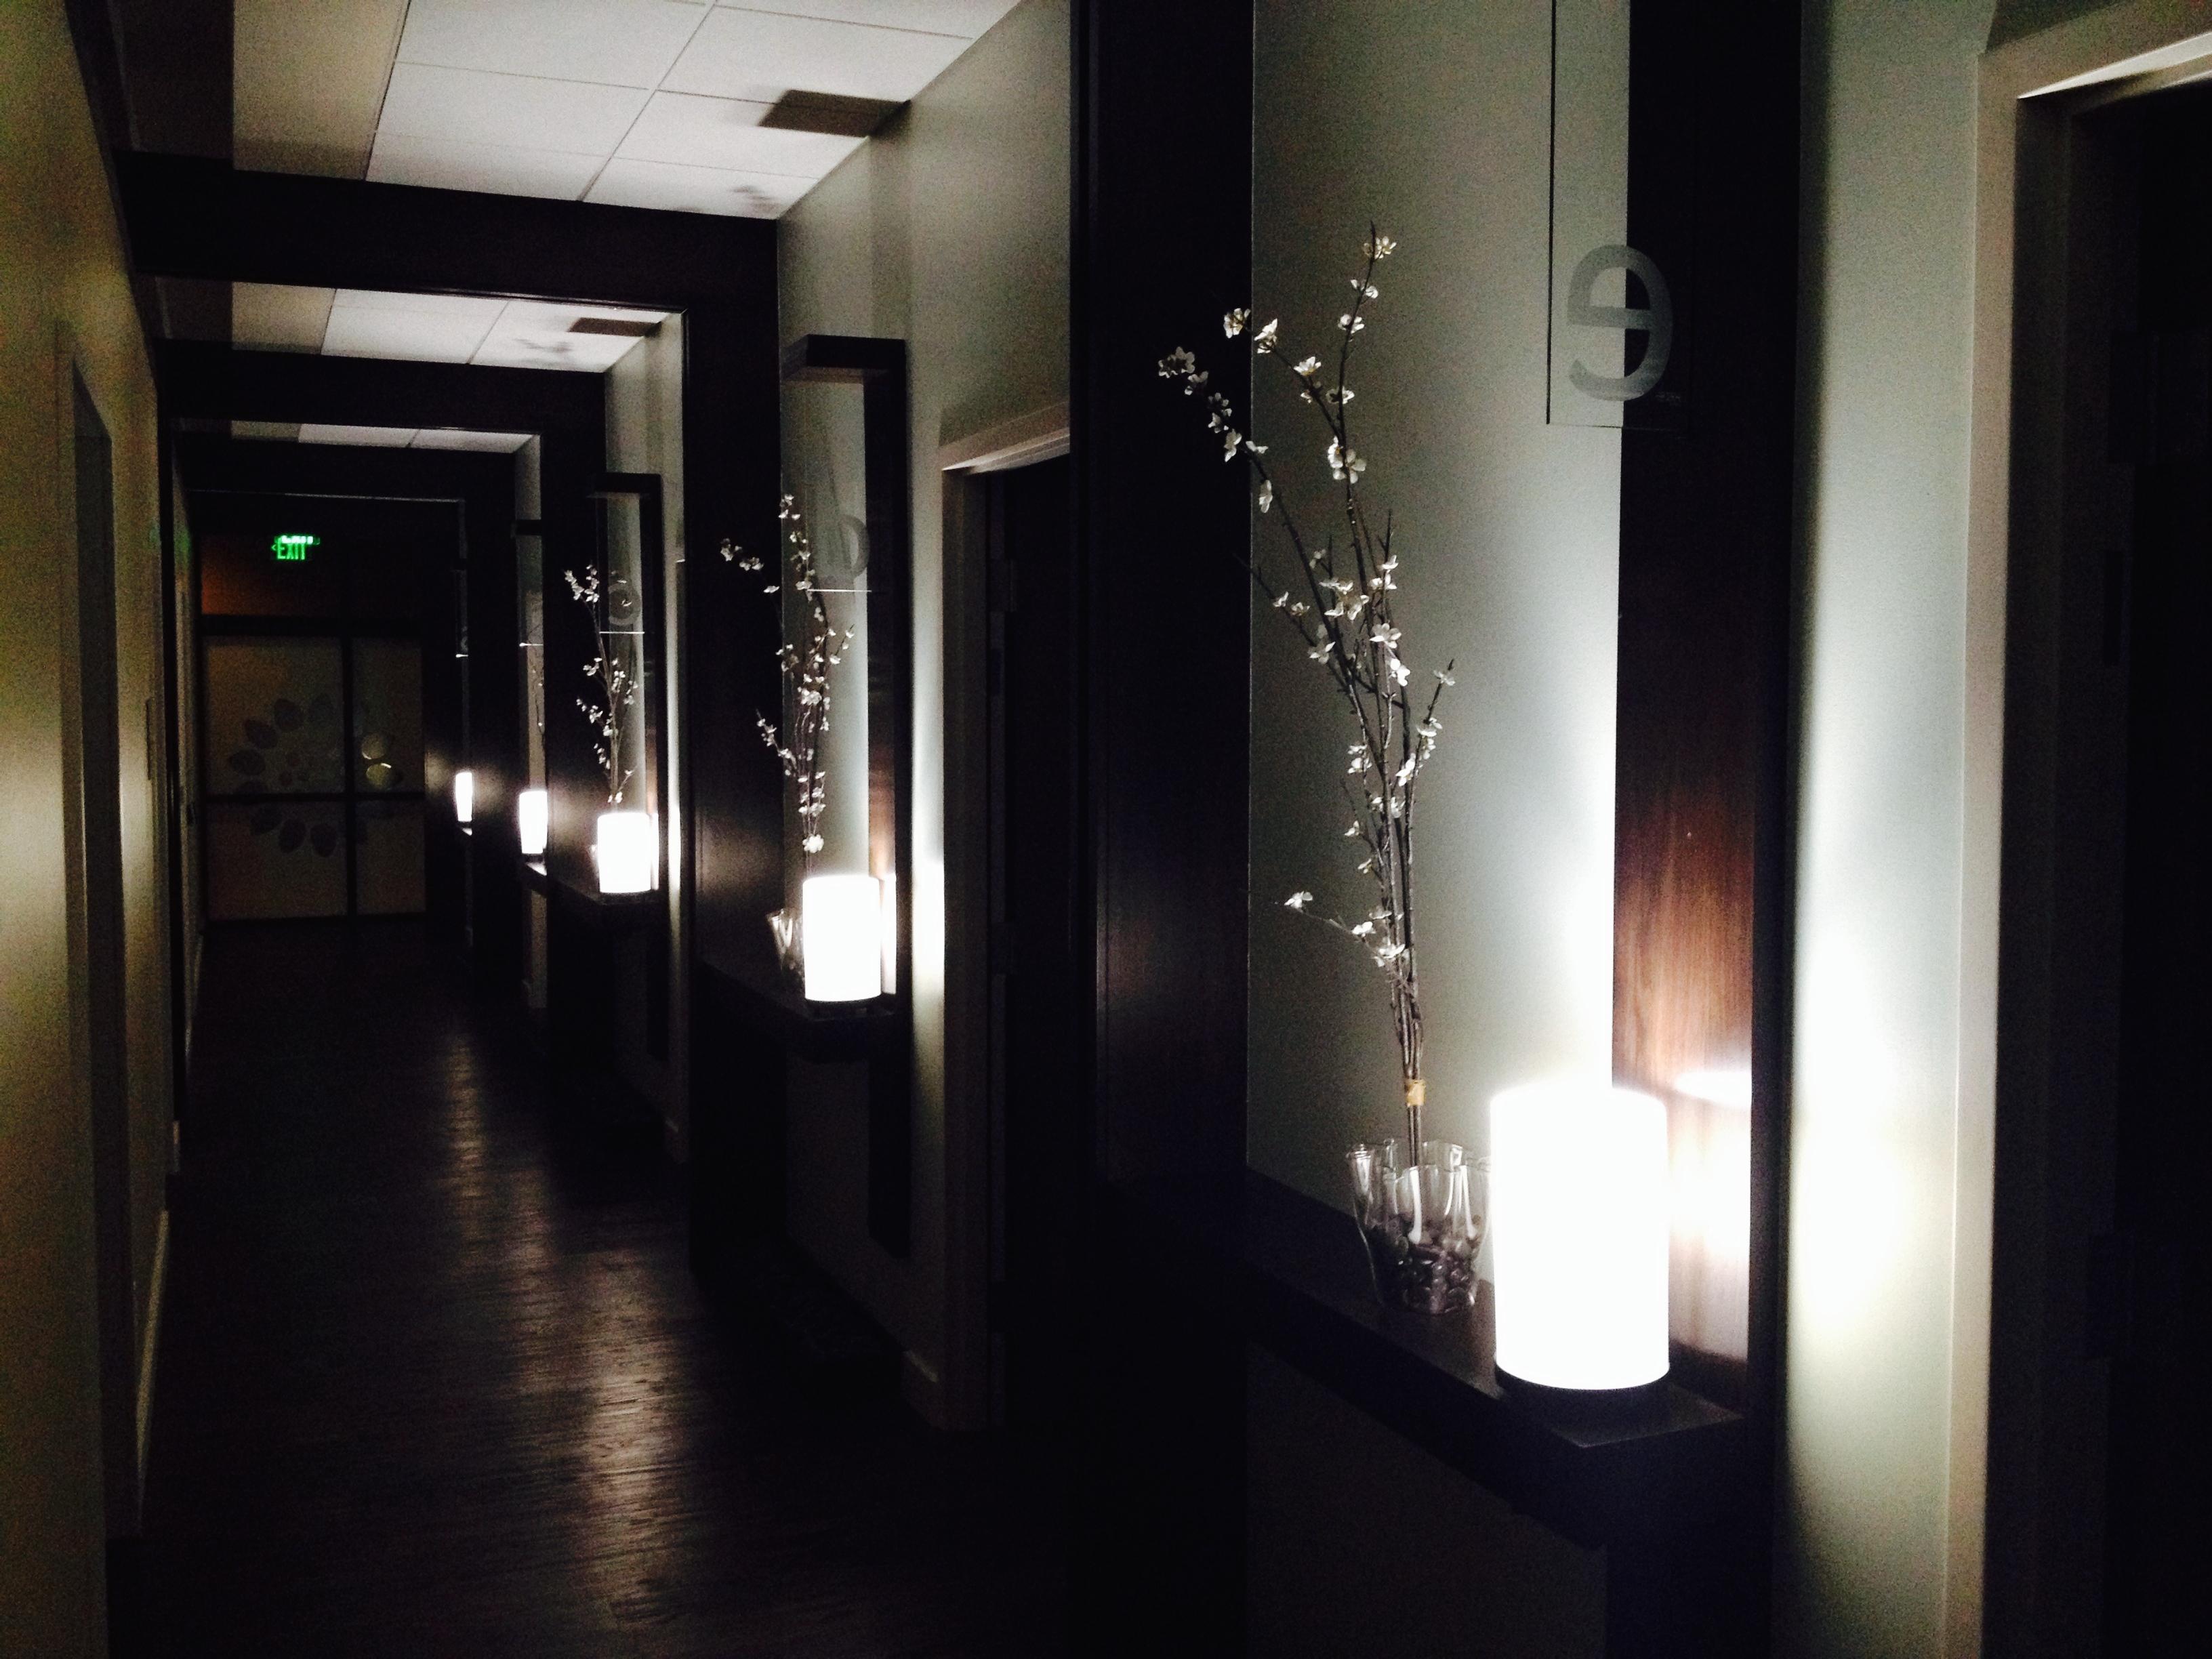 Exam Hallway